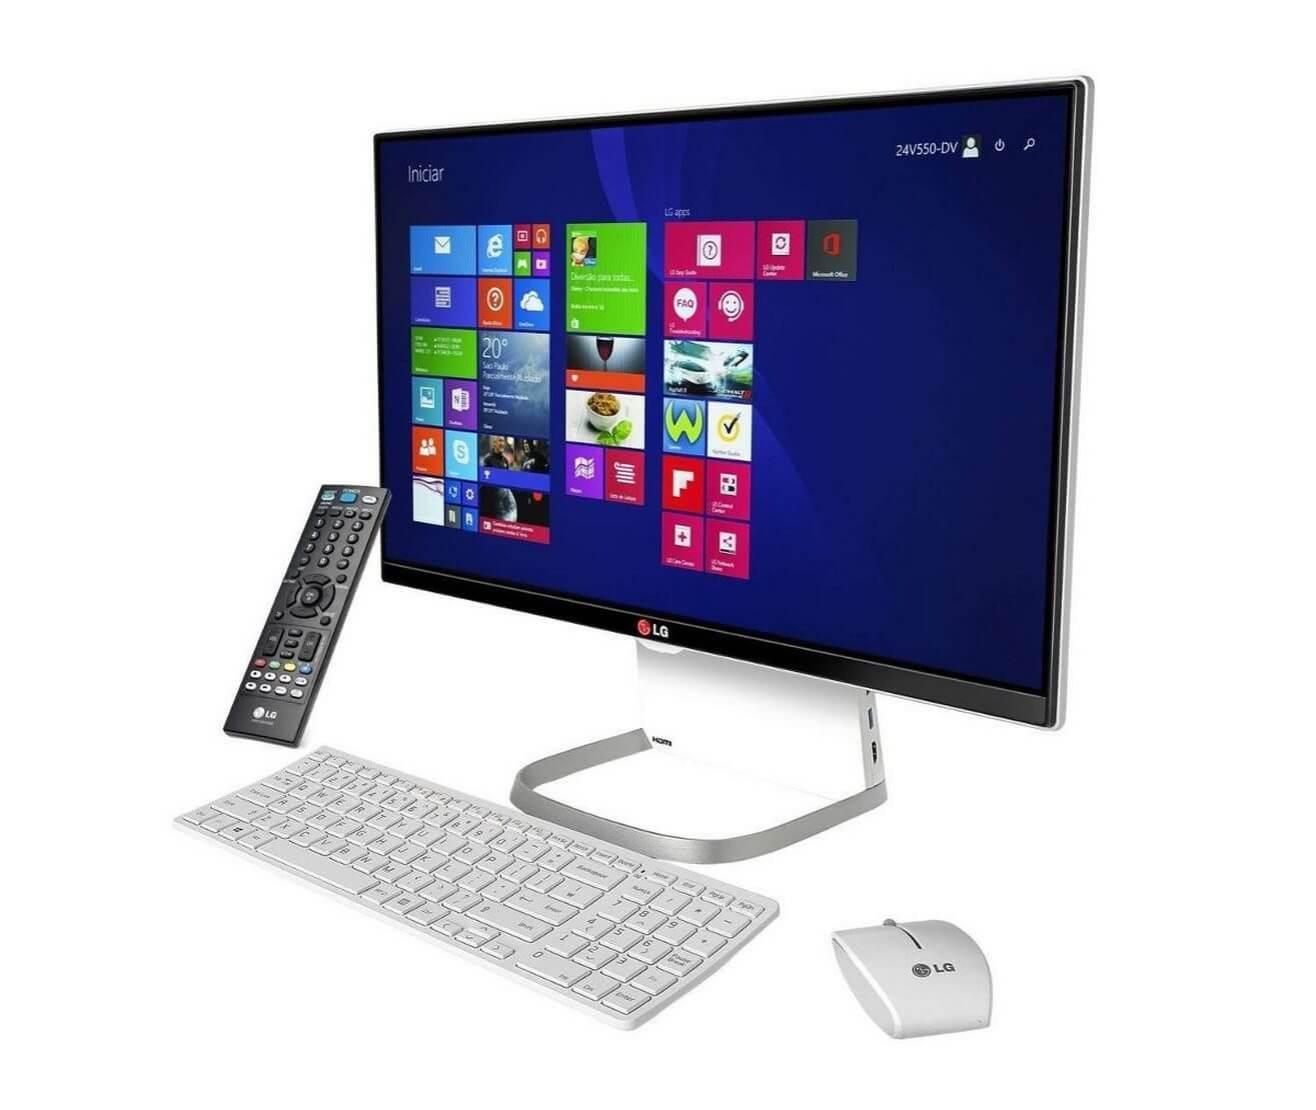 smt allinonelg gal slice - Review: conheça o PC All-in-One da LG (All in One 27v750)